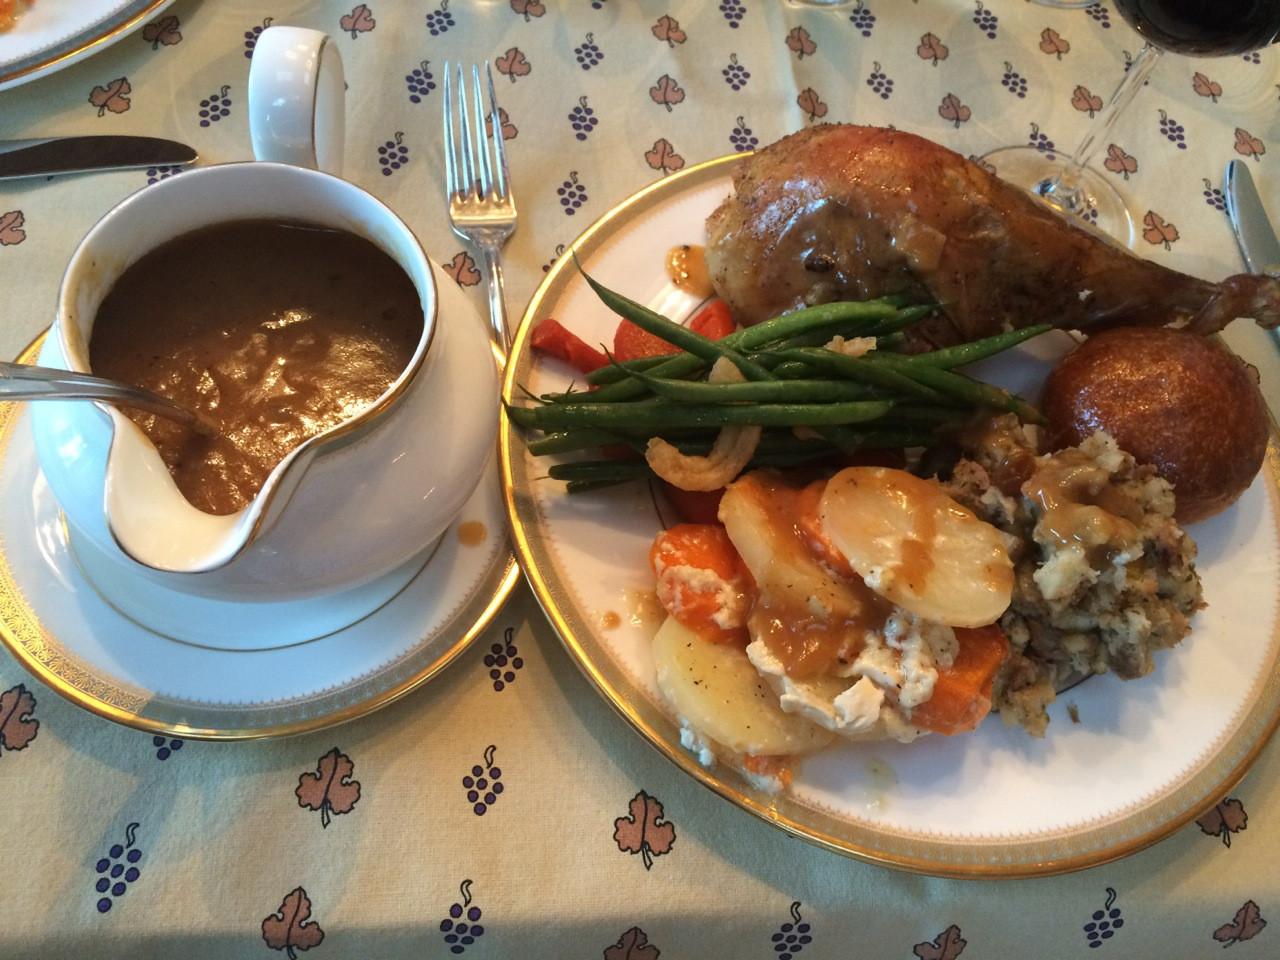 Ina Garten Thanksgiving Gravy Recipe  Ina Garten s Homemade Make Ahead Gravy Everyday Cooking